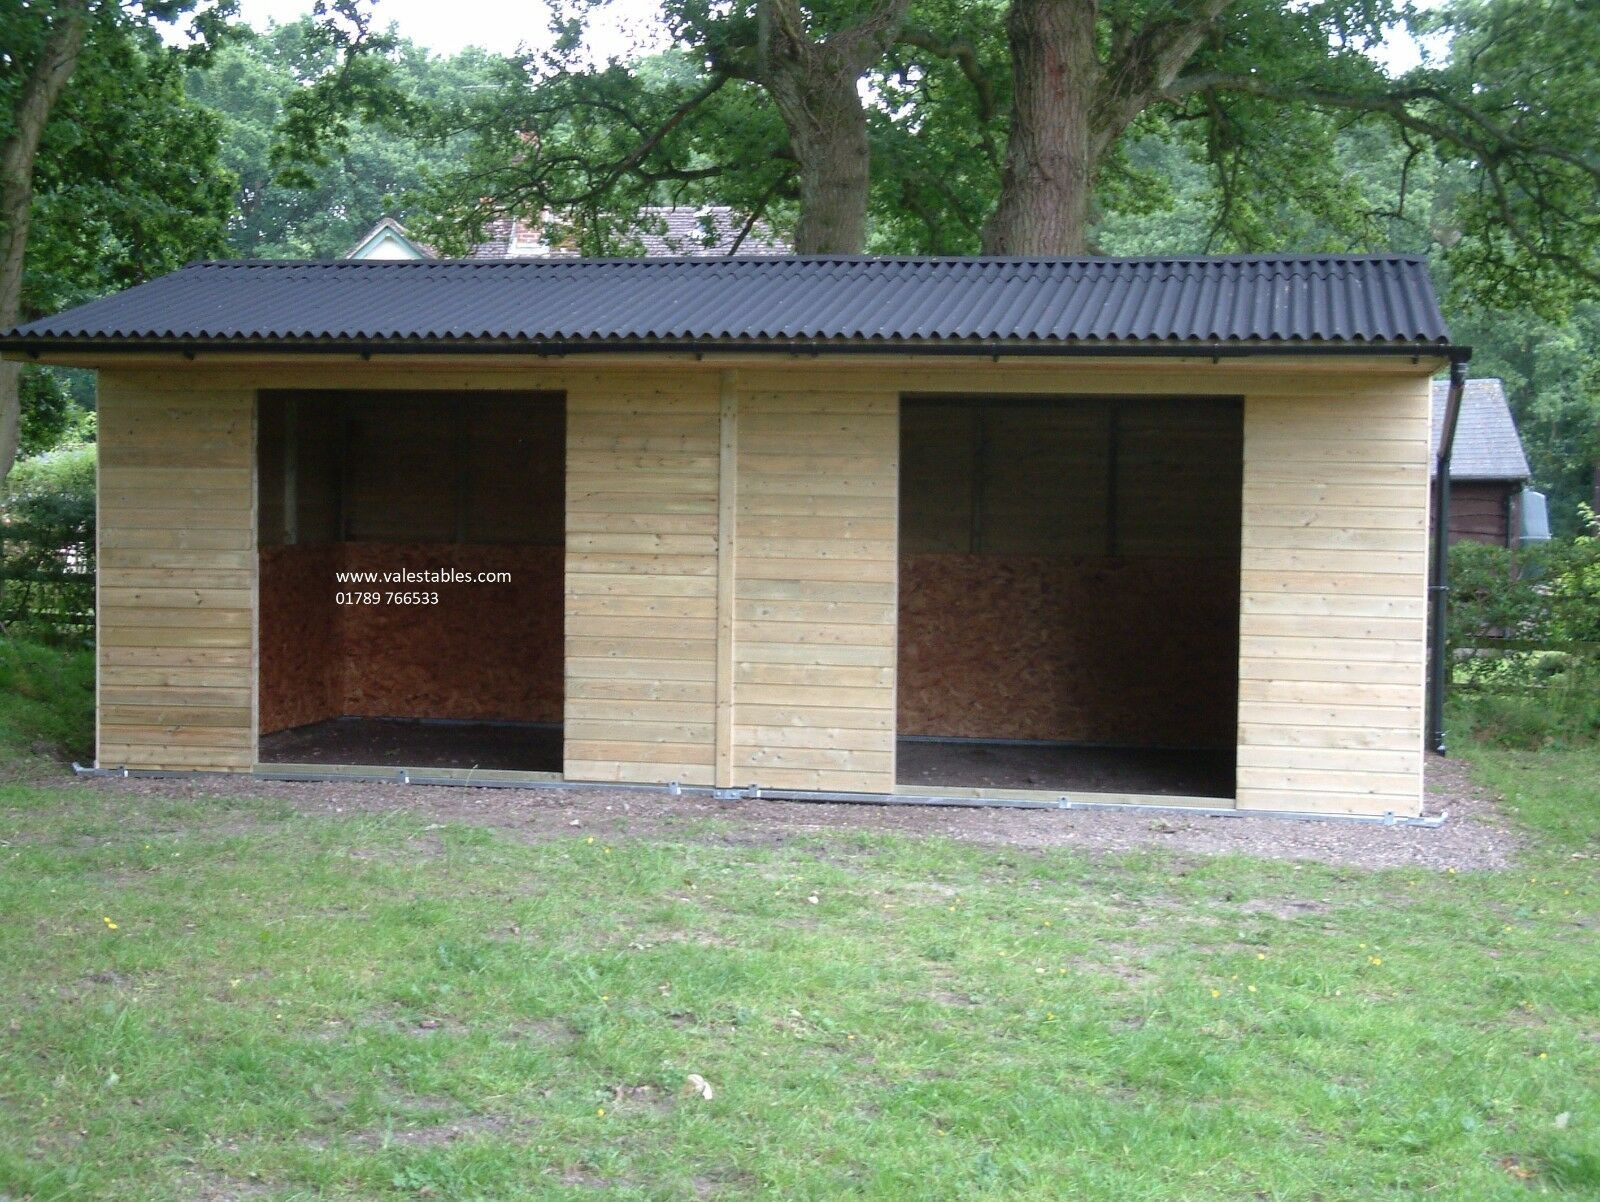 Field Shelter 12x24,  Mobile Field Shelter, Stable, Stables Horses VA005